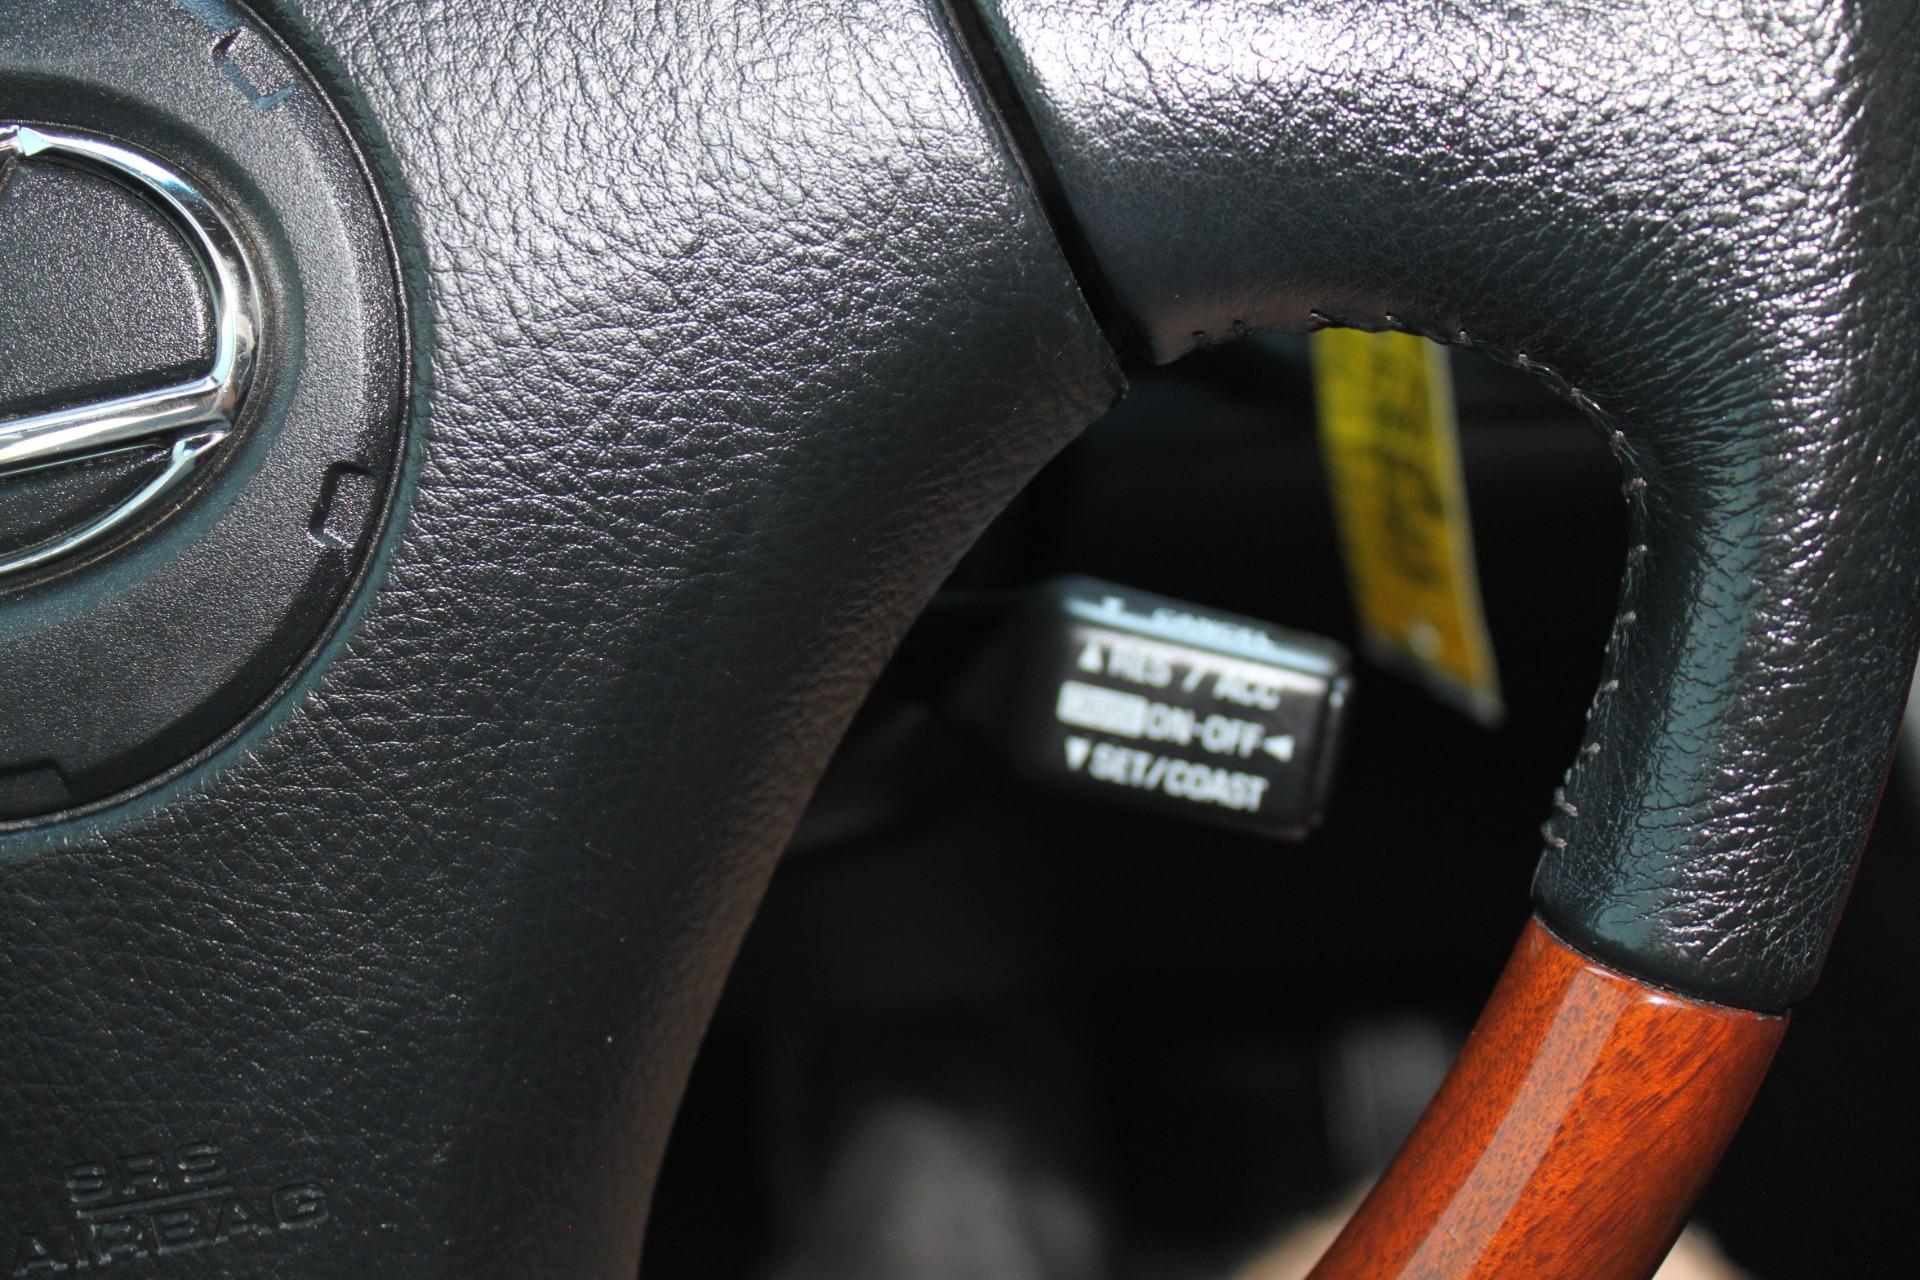 Used-2003-Lexus-RX-300-AWD-Range-Rover